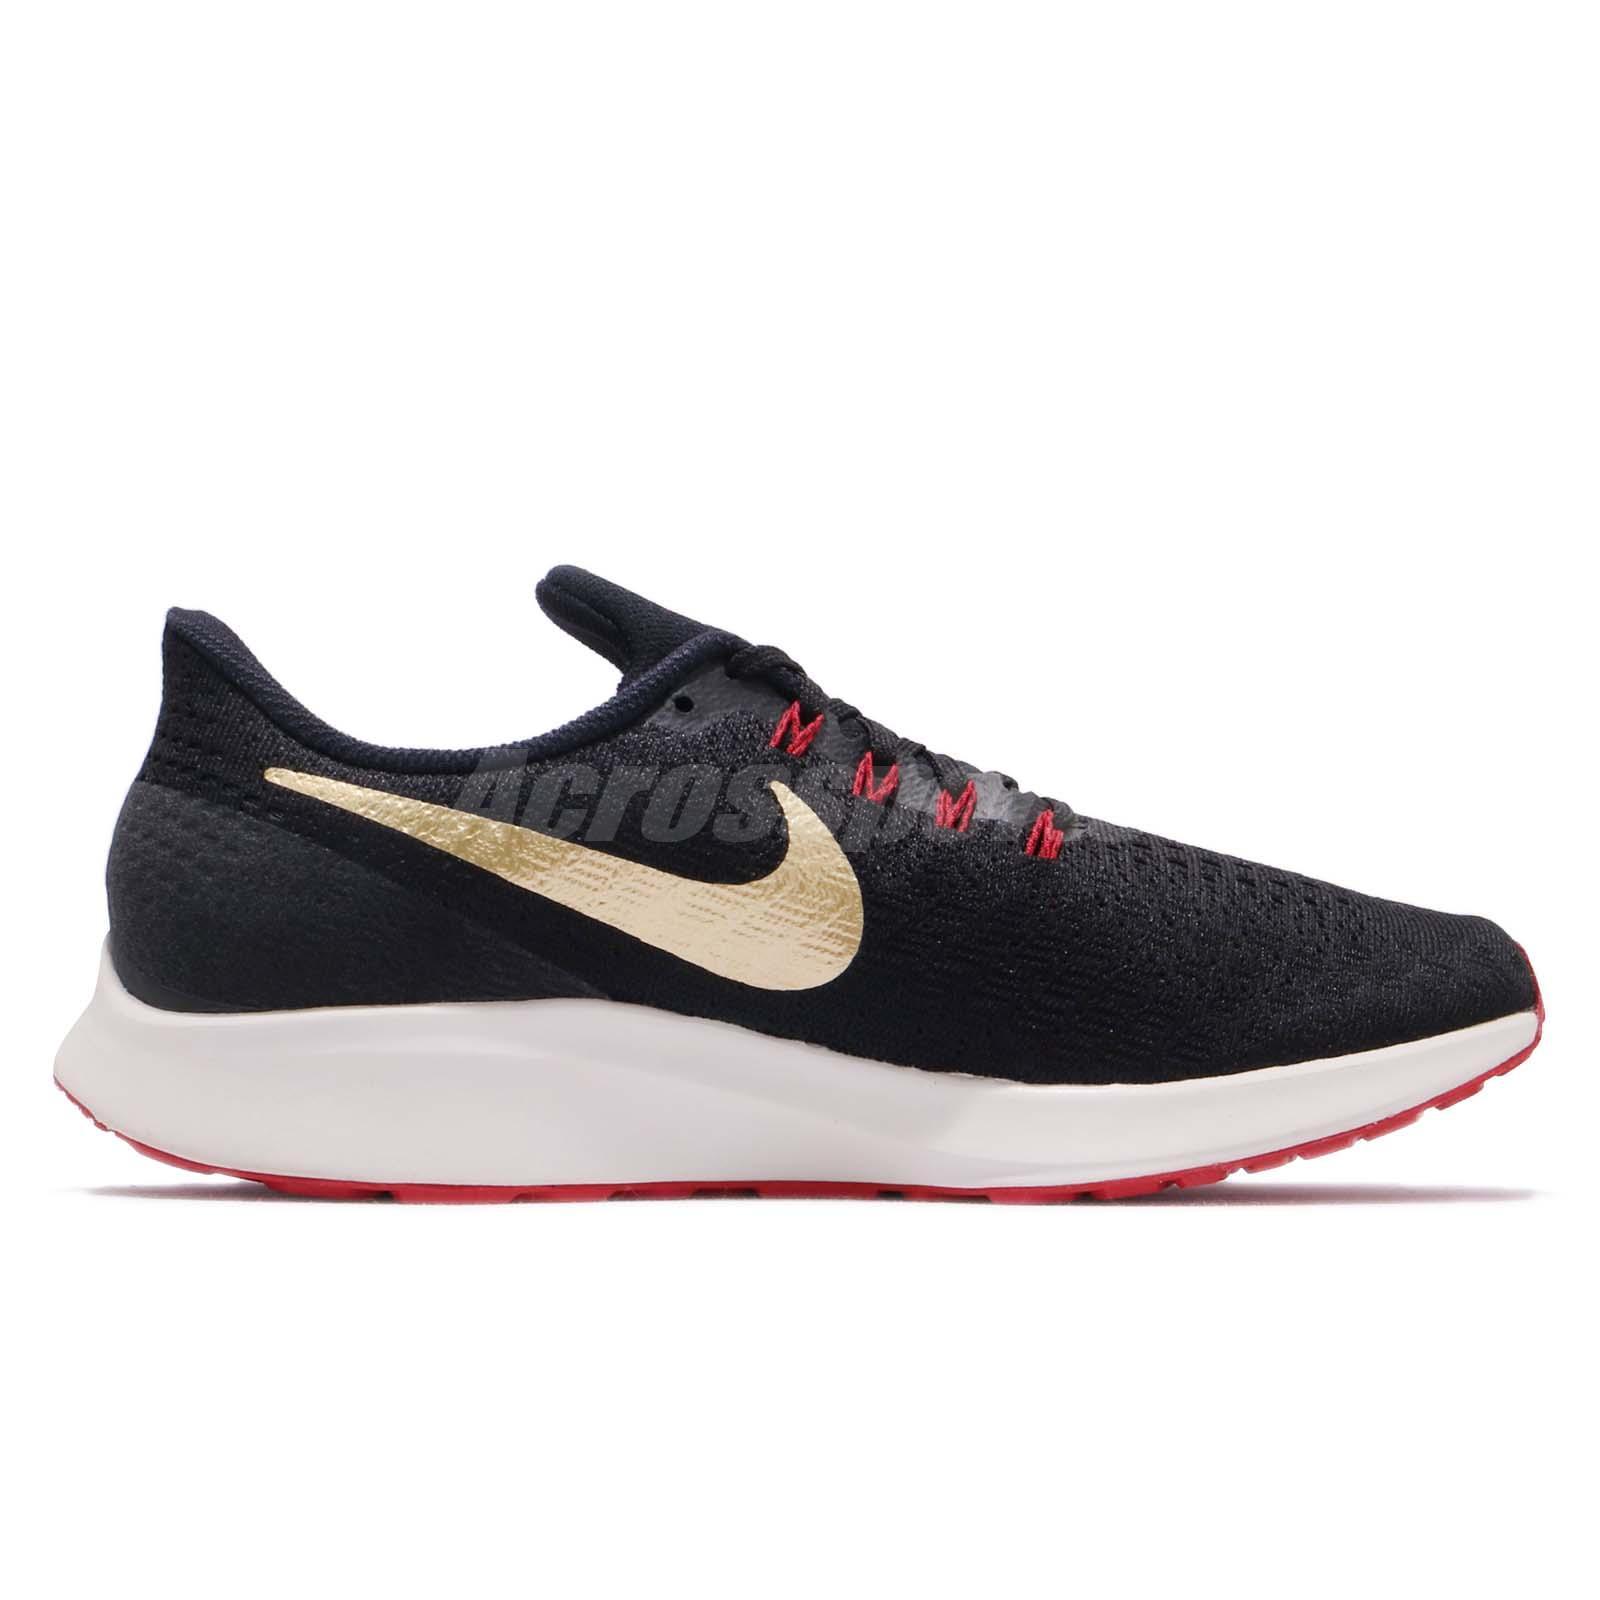 2c1d1cdaee38b Nike Air Zoom Pegasus 35 Black Gold Red Men Running Shoes Sneakers ...